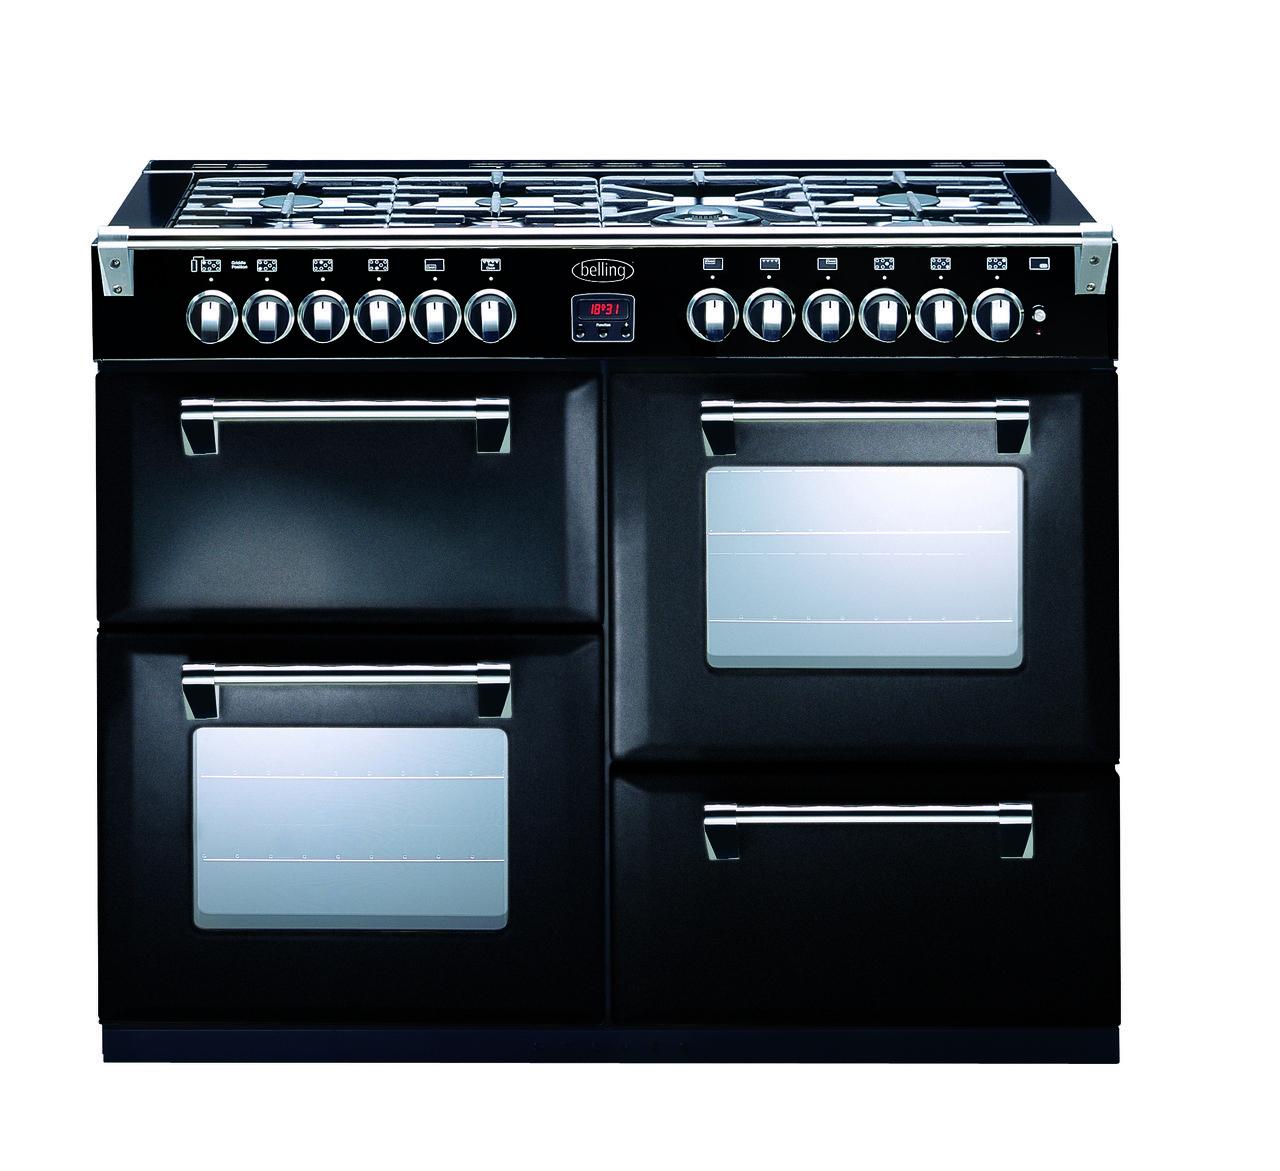 Berloni Appliances - BELLING 110CM BLACK RICHMOND DUAL FUEL FREESTANDING OVEN - BR1100DF, $5,499.00 (http://www.berloniappliances.com.au/belling-110cm-black-richmond-dual-fuel-freestanding-oven-br1100df/)